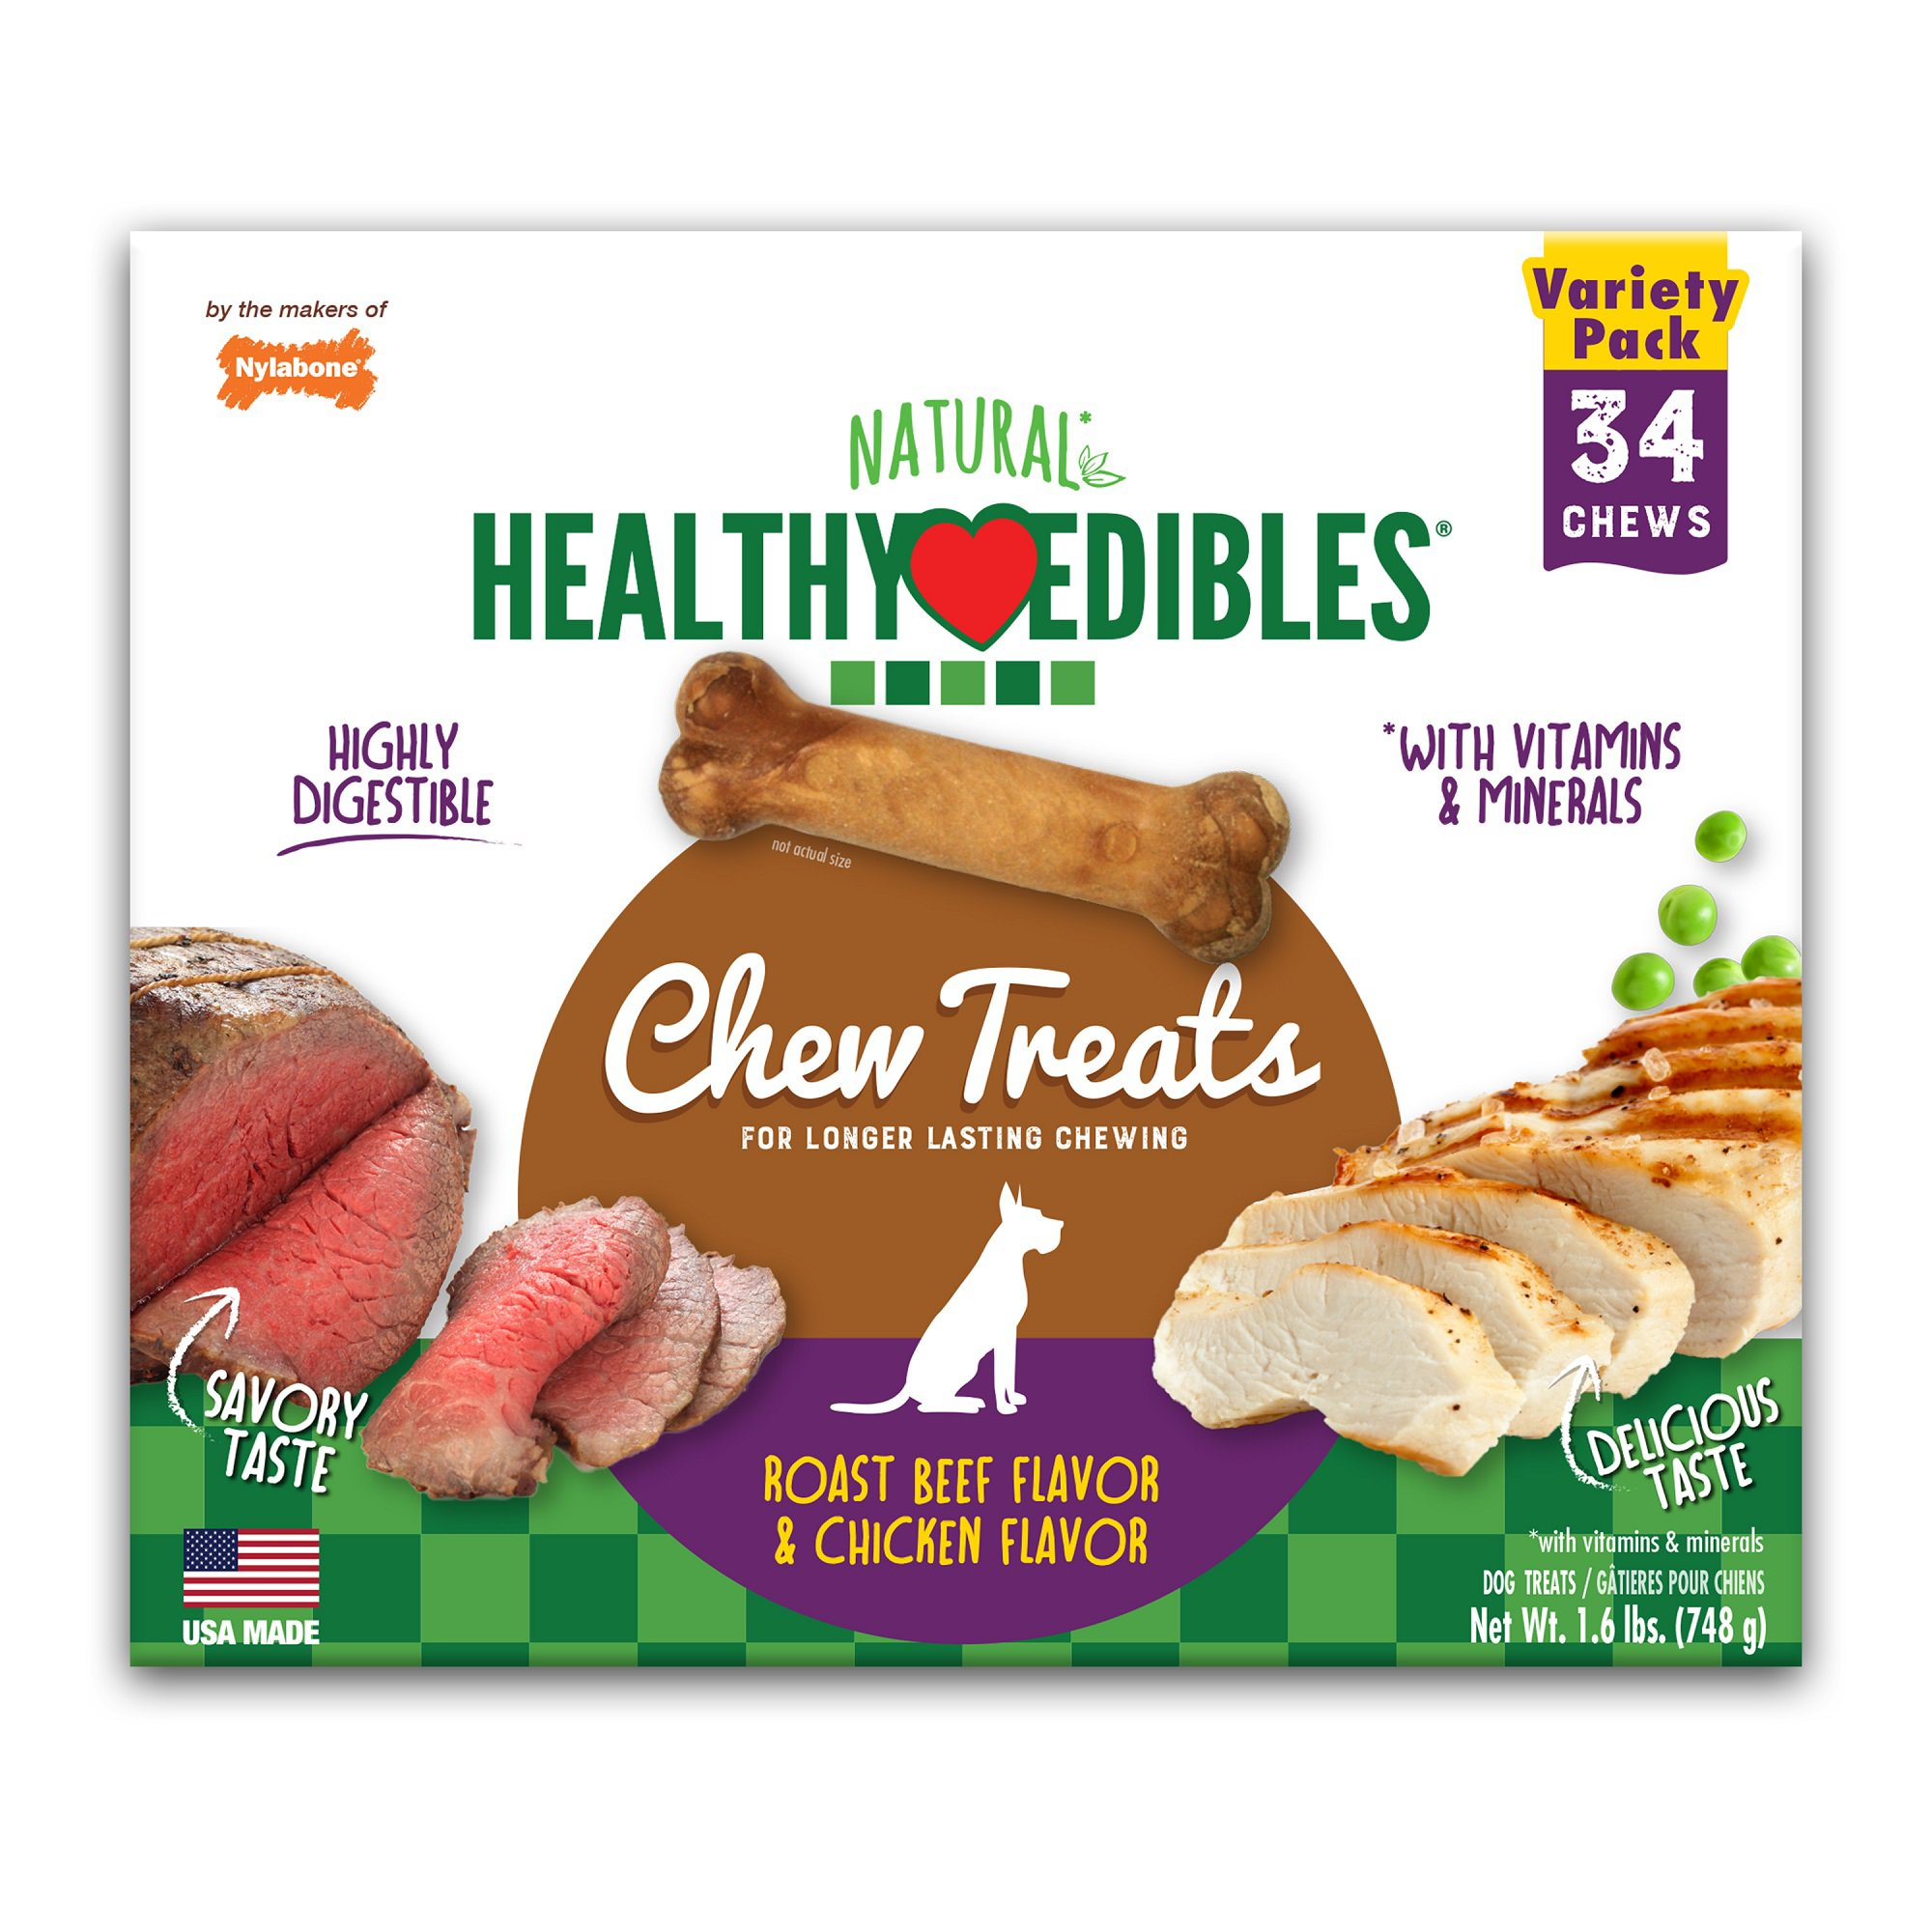 Nylabone Healthy Edibles 2 Flavor Variety Pack Petite Dog Bone Chews, X-Small, 26.3 oz.